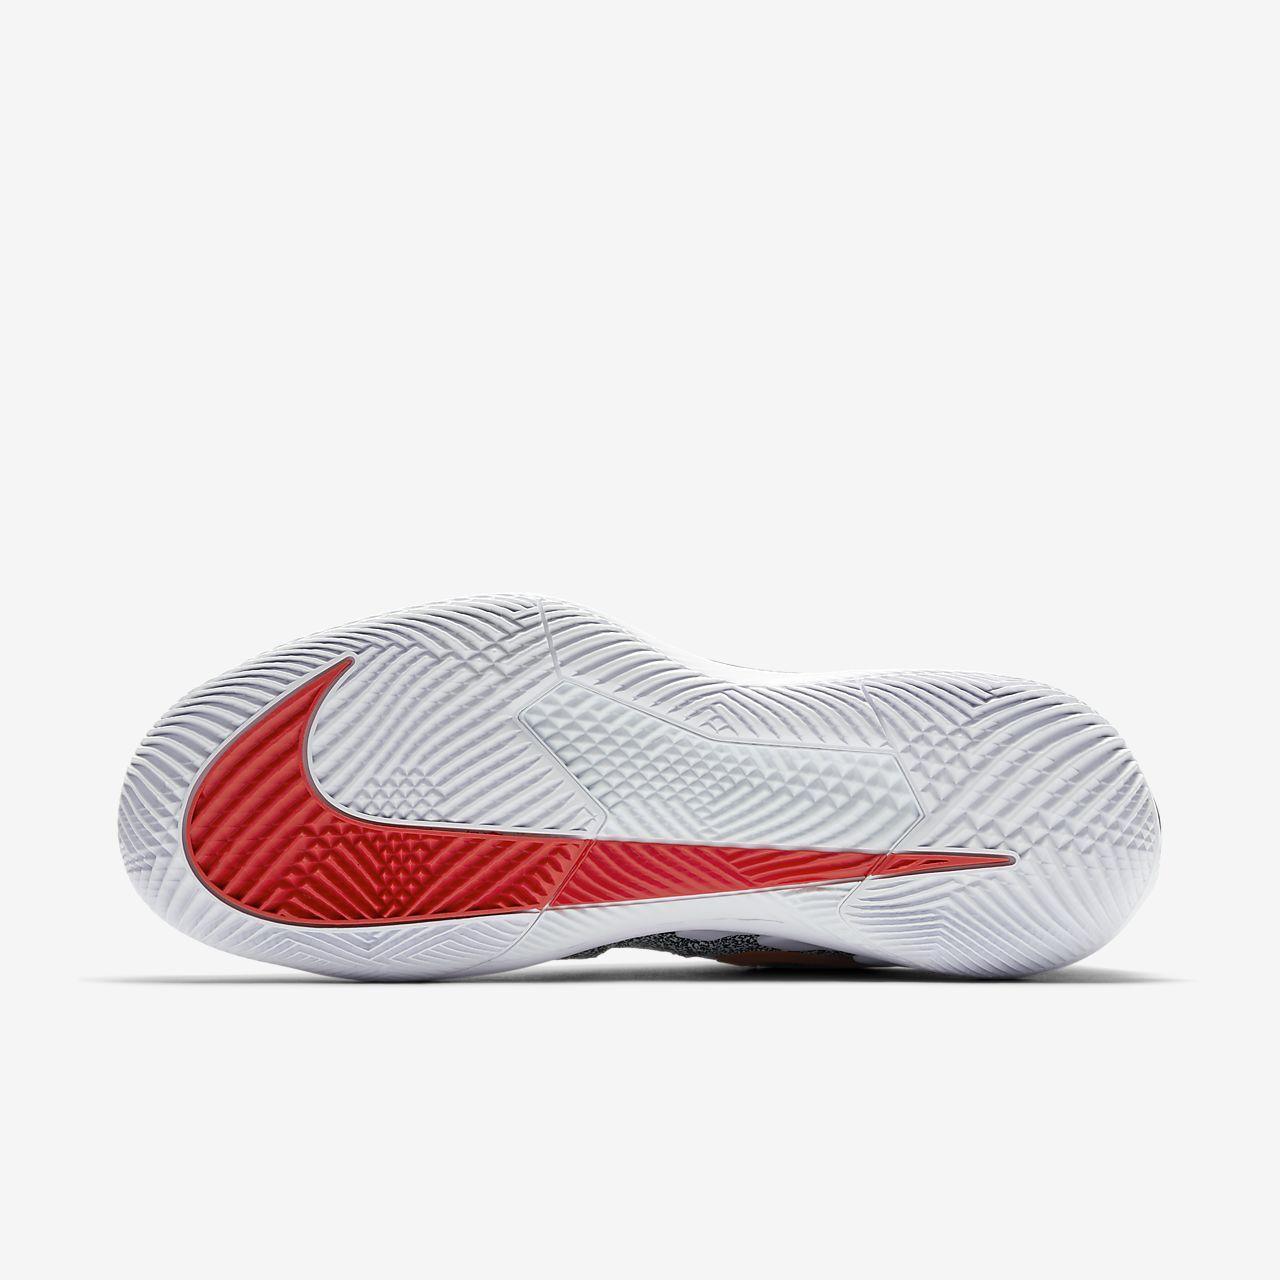 Nike - Nike Air Zoom Ultra Hommes Chaussure de tennis - EU 43 - US 9,5 rouge